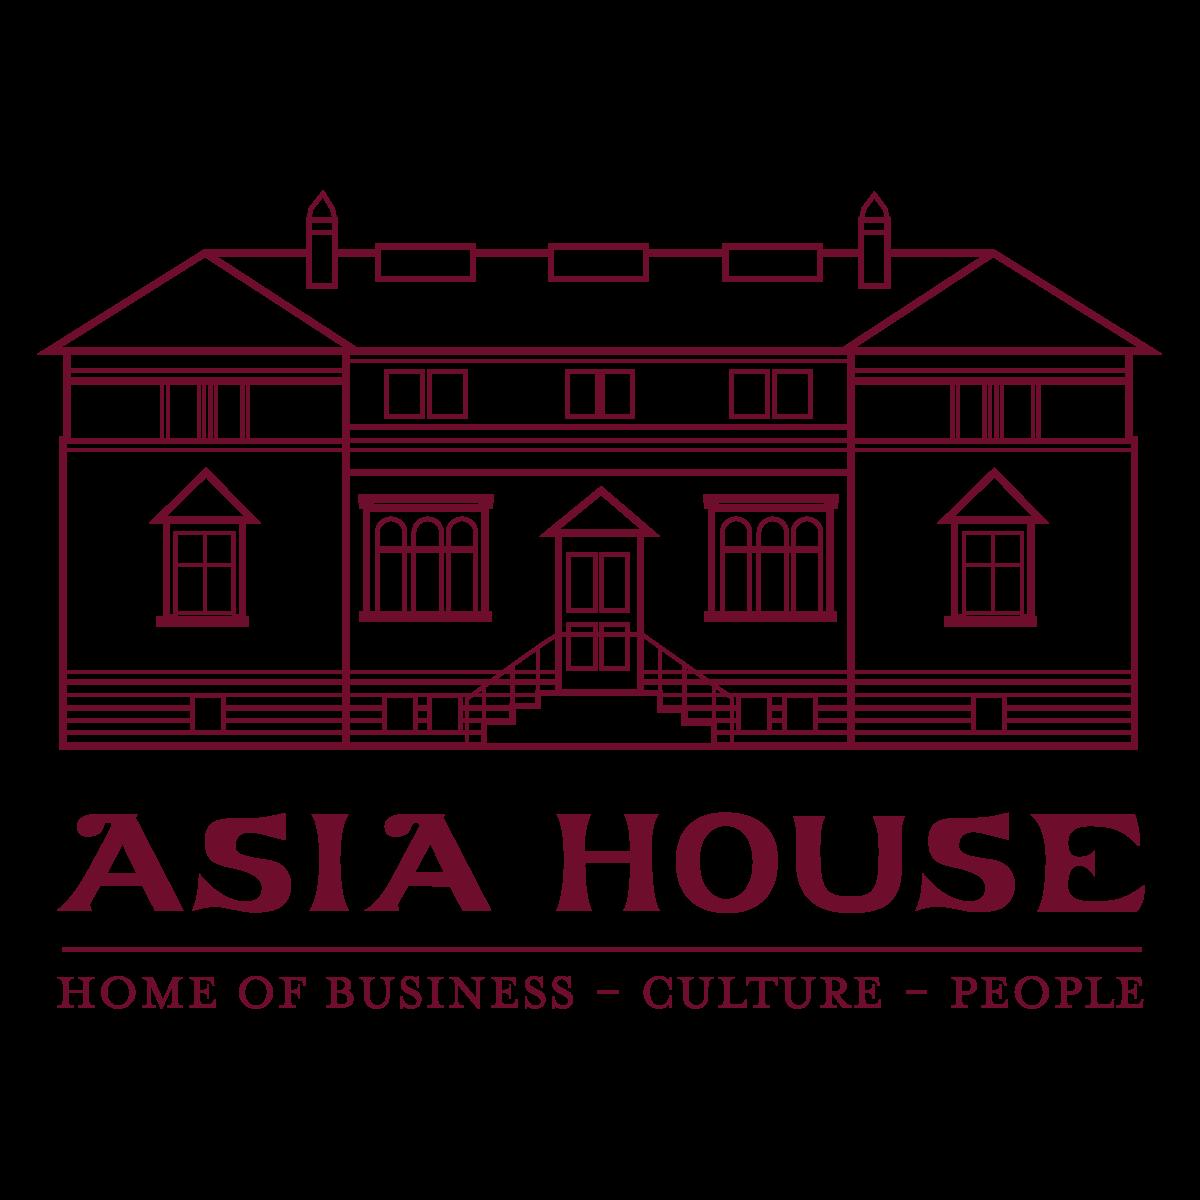 asien house